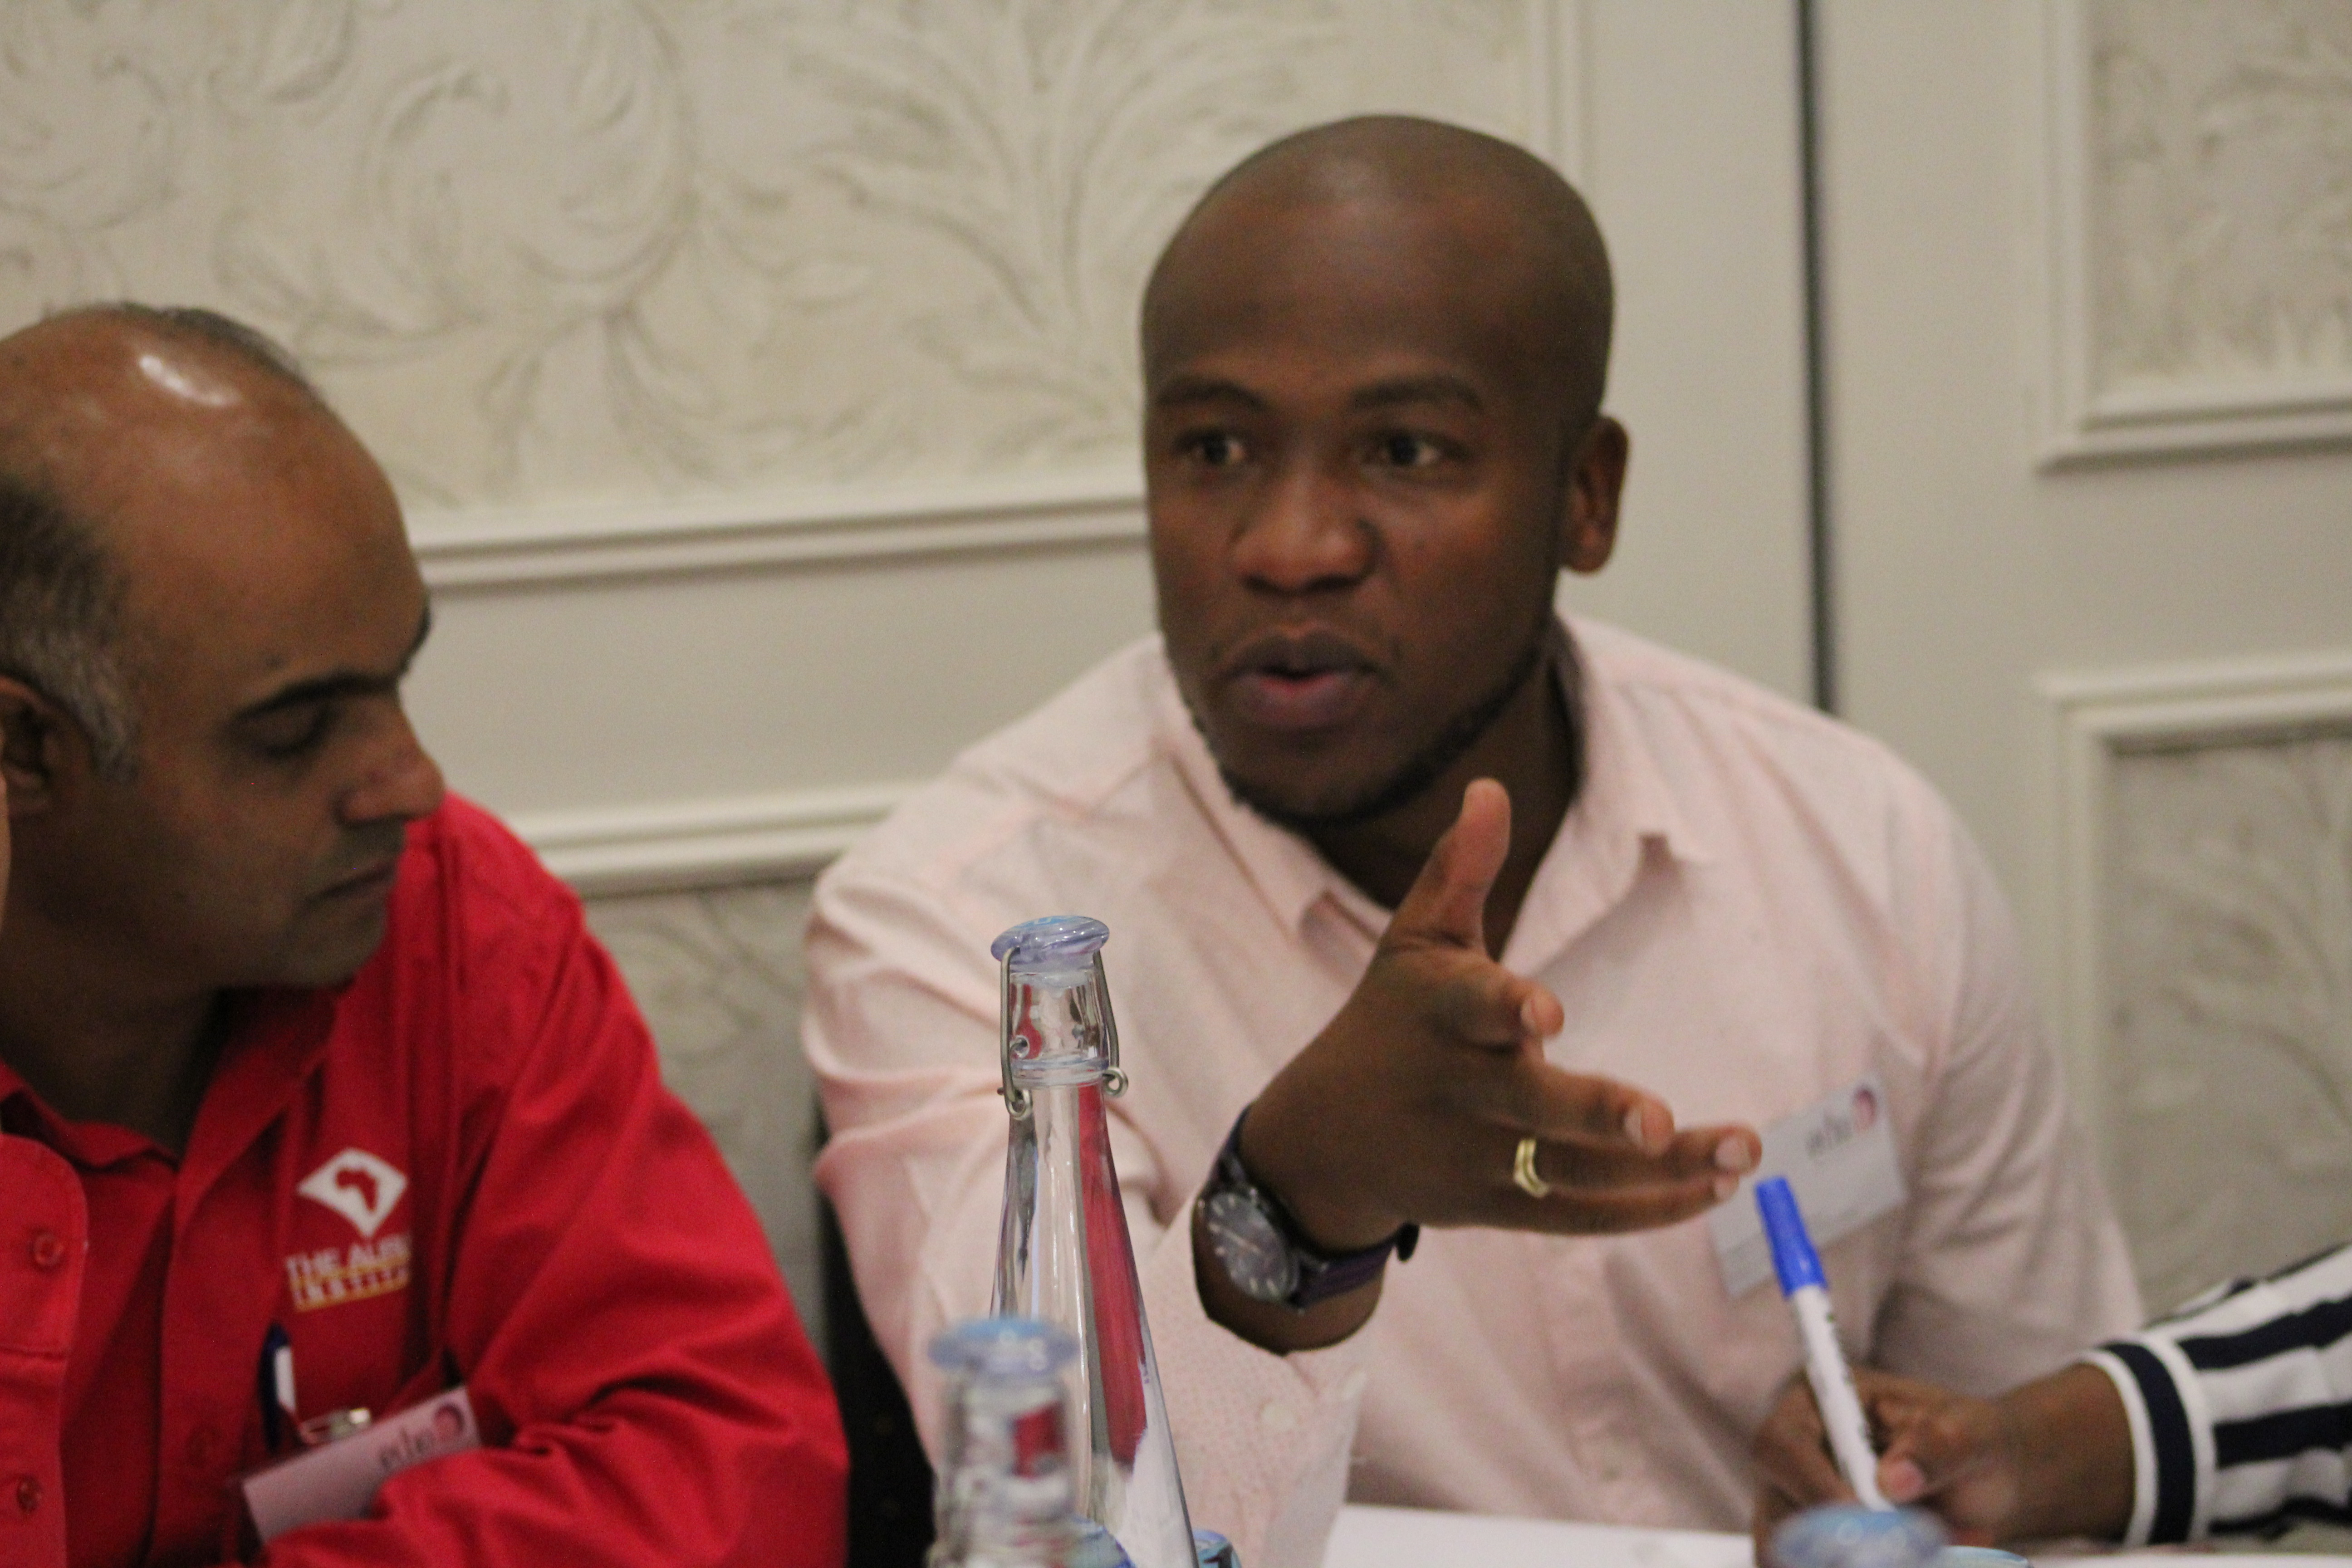 Thulani Mazibuko, Qhakaza Mbokodo (QM) Research Clinic, Ladysmith